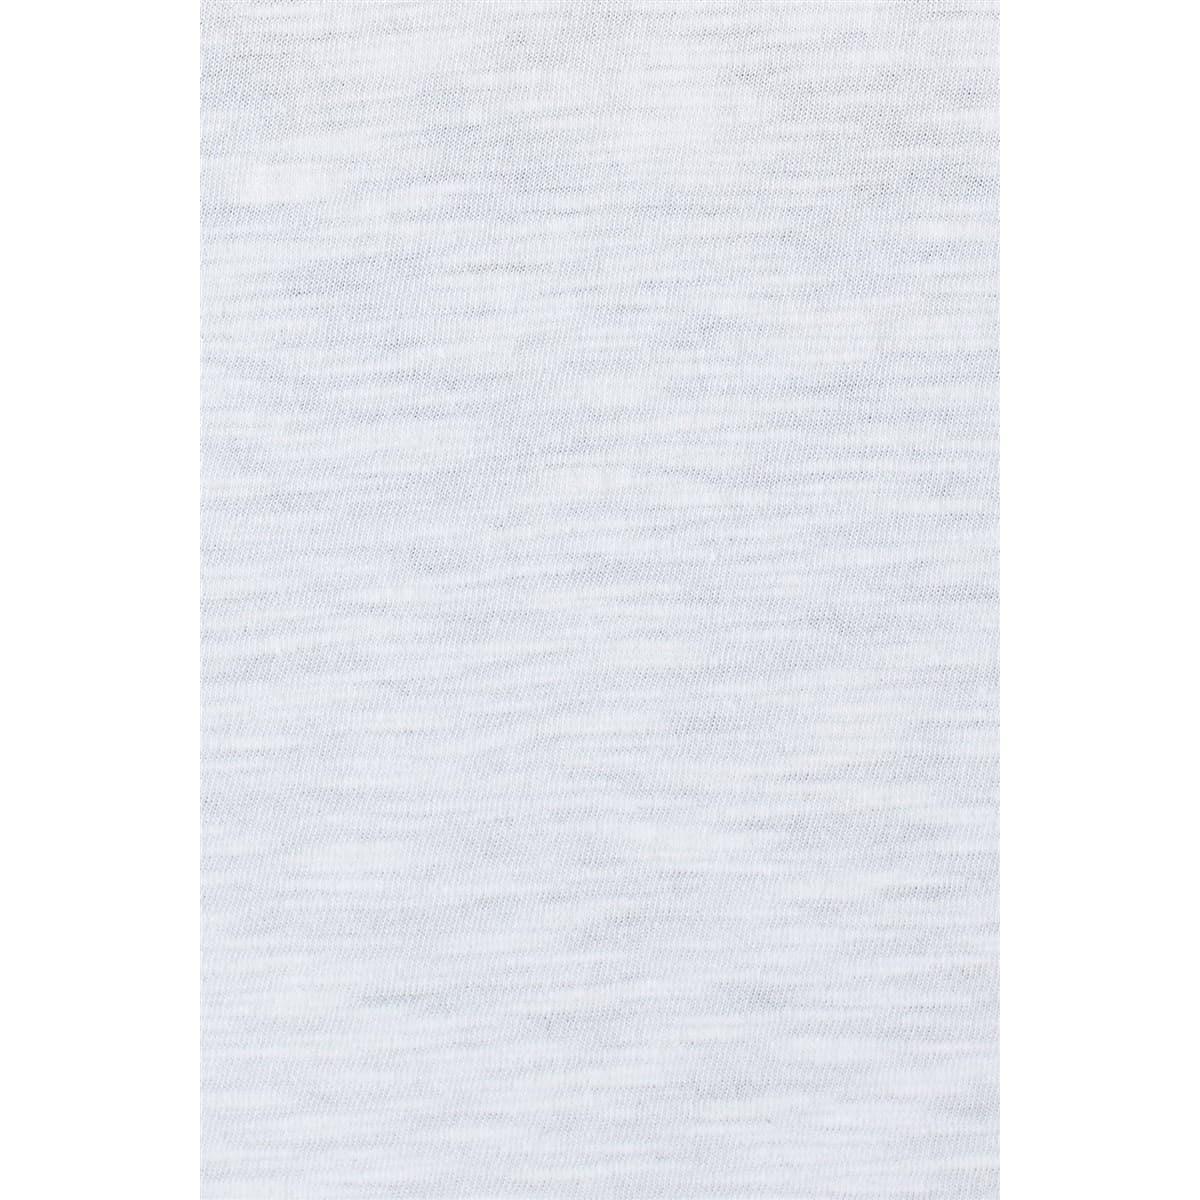 Yirtmaç Detayli Penye Beyaz